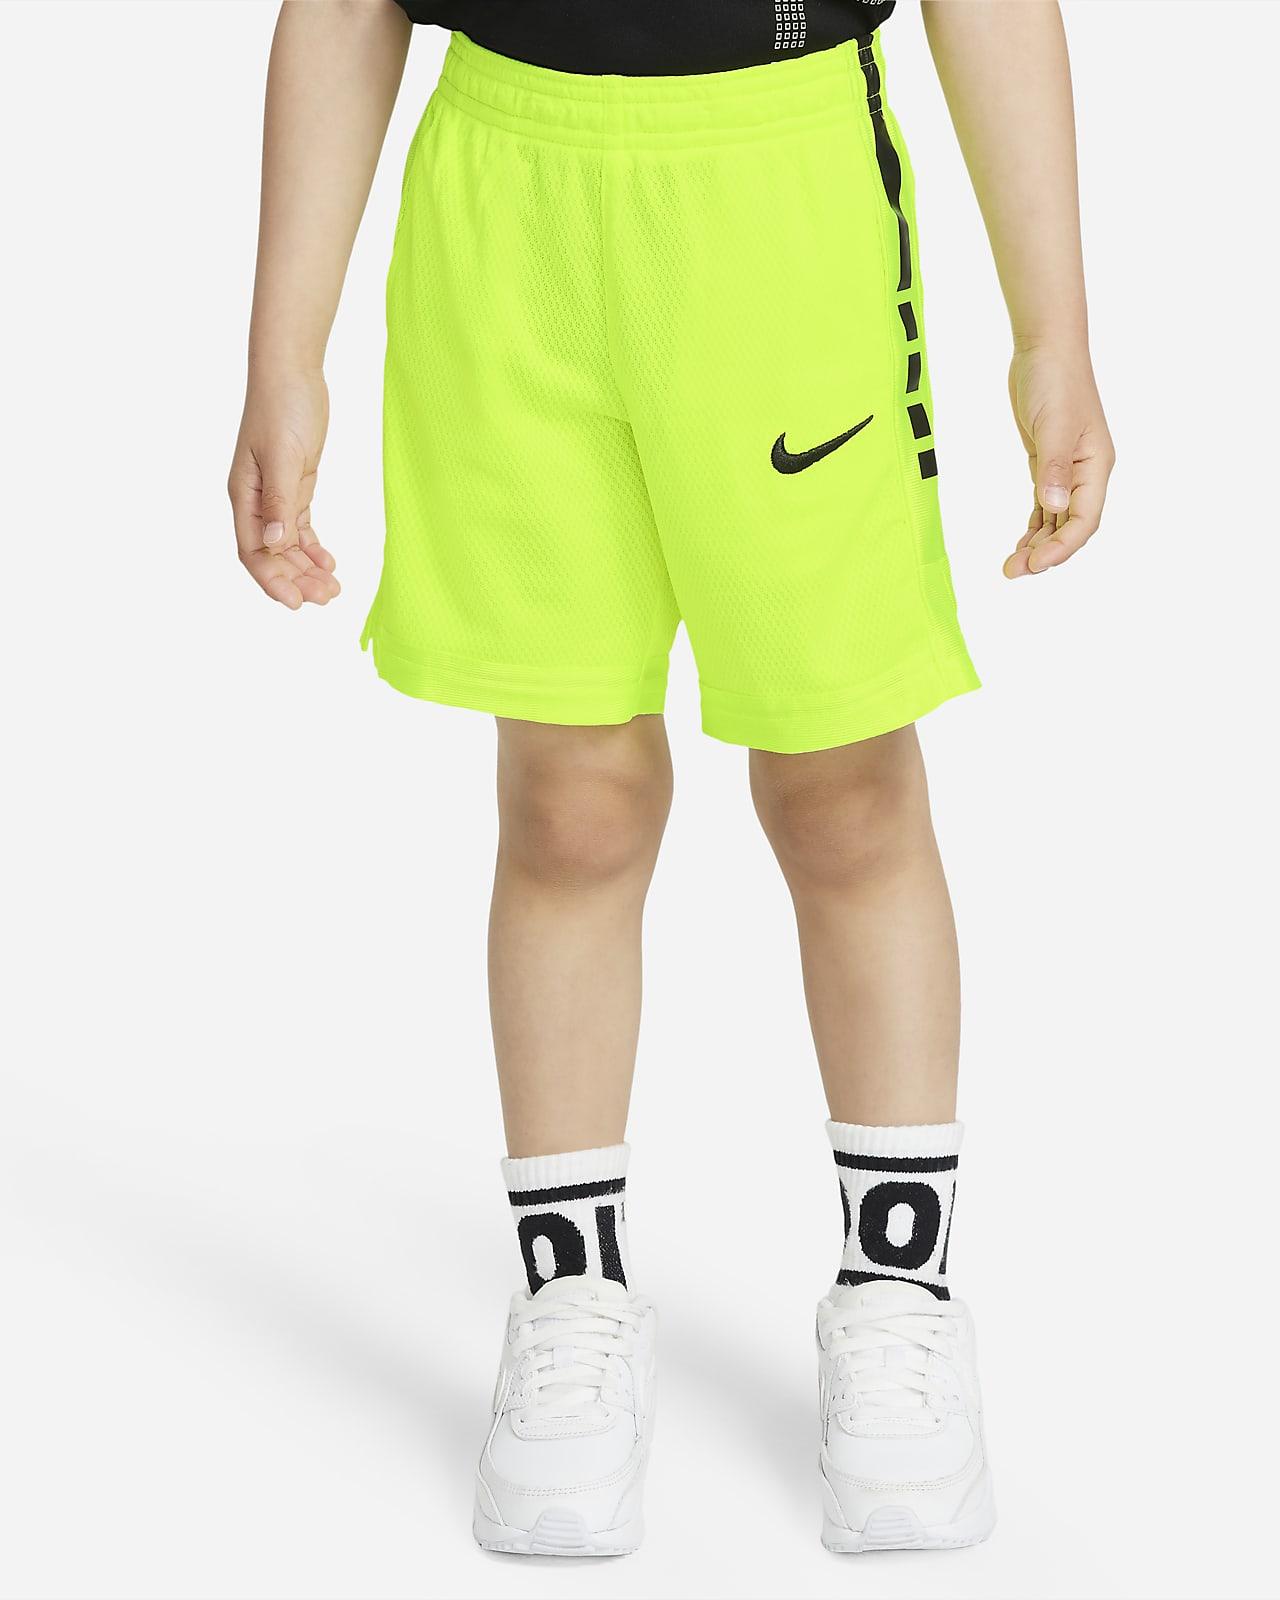 Shorts para bebé Nike Dri-FIT Elite